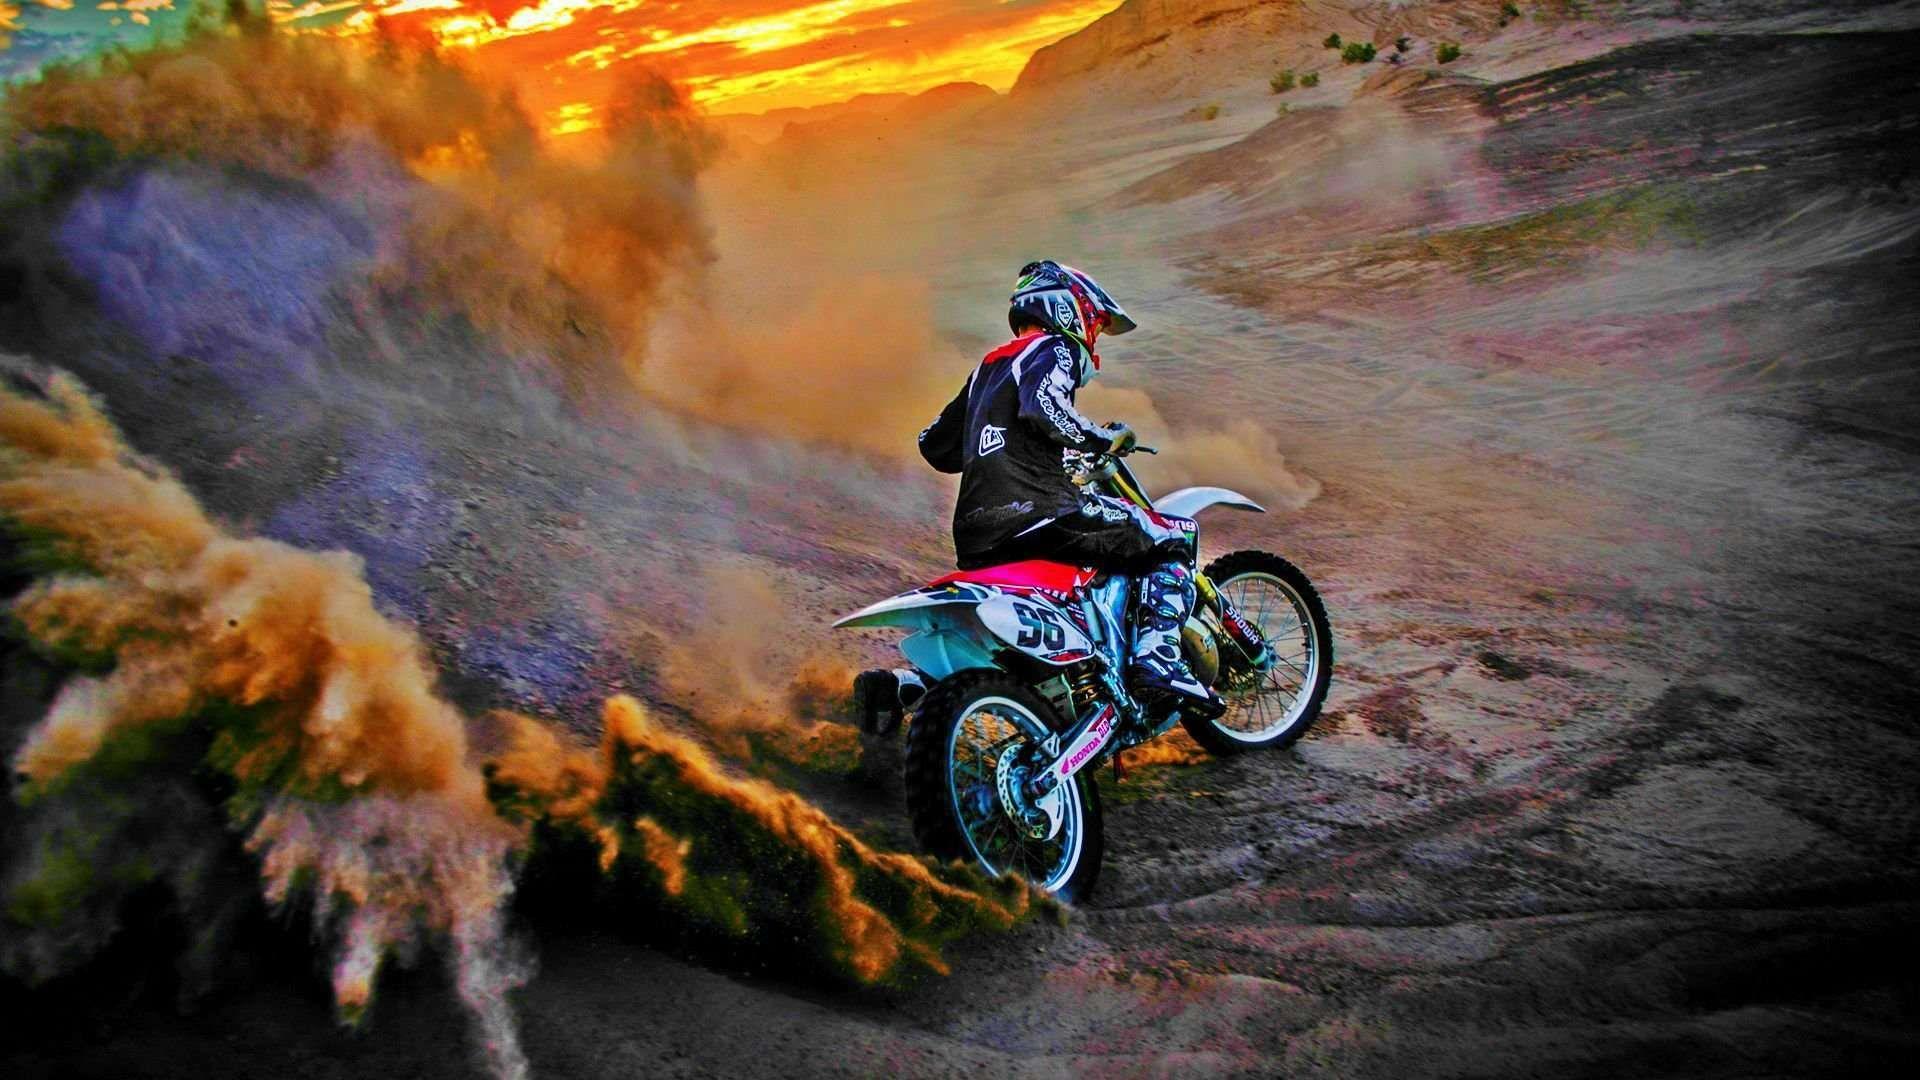 bike racing wallpaper hd - photo #39